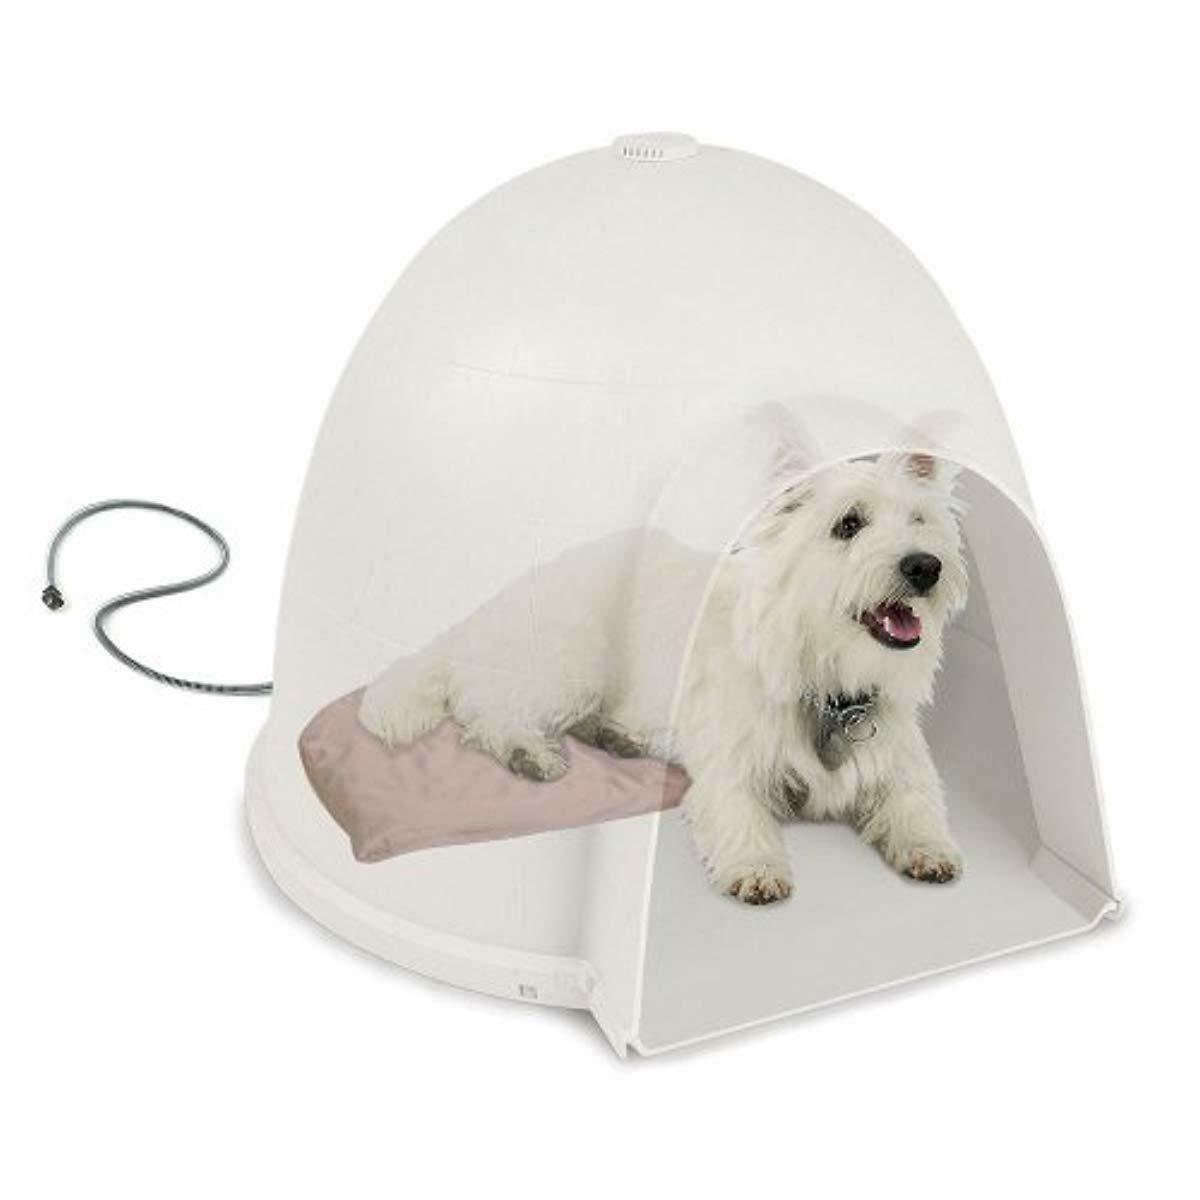 Igloo Soft Heated Dog Dome Heating Pad Size: